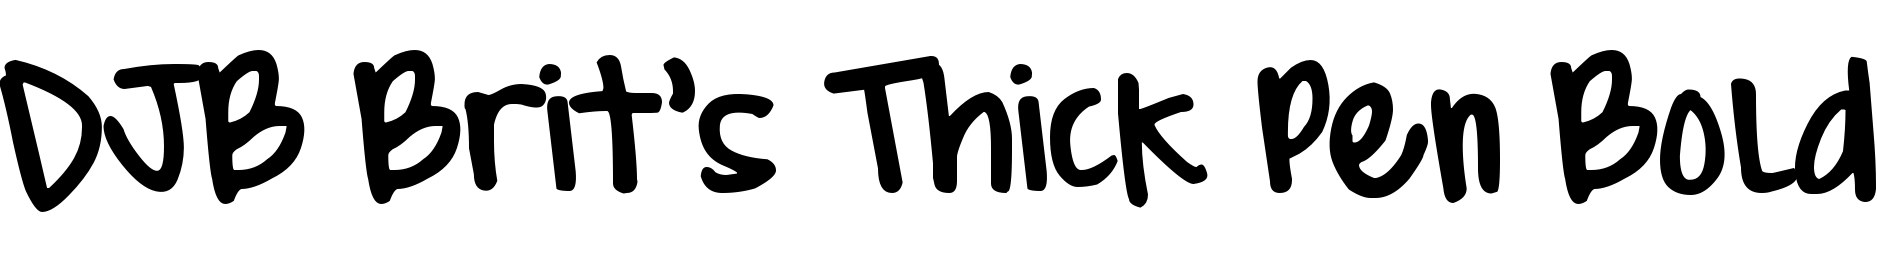 DJB Brit's Thick Pen Bold